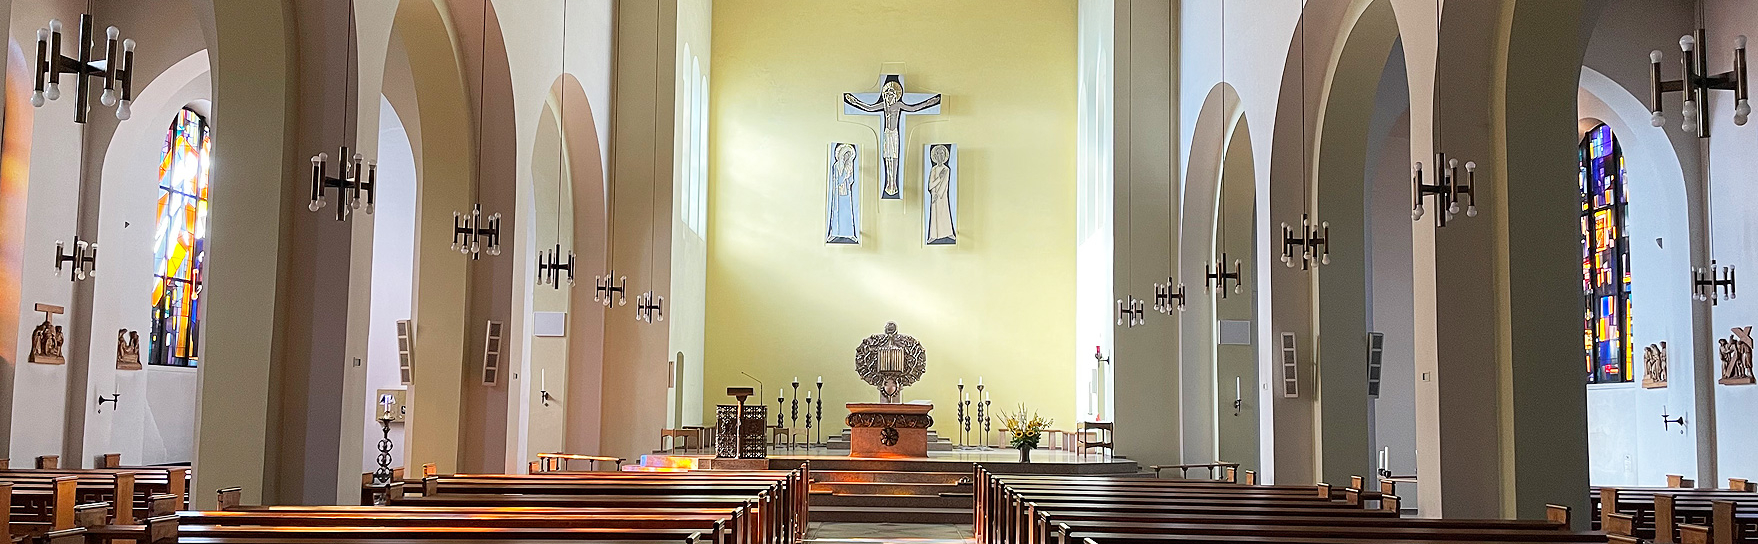 Kircheninnenraum der Pfarrei St. Maria Hamburg-Harburg